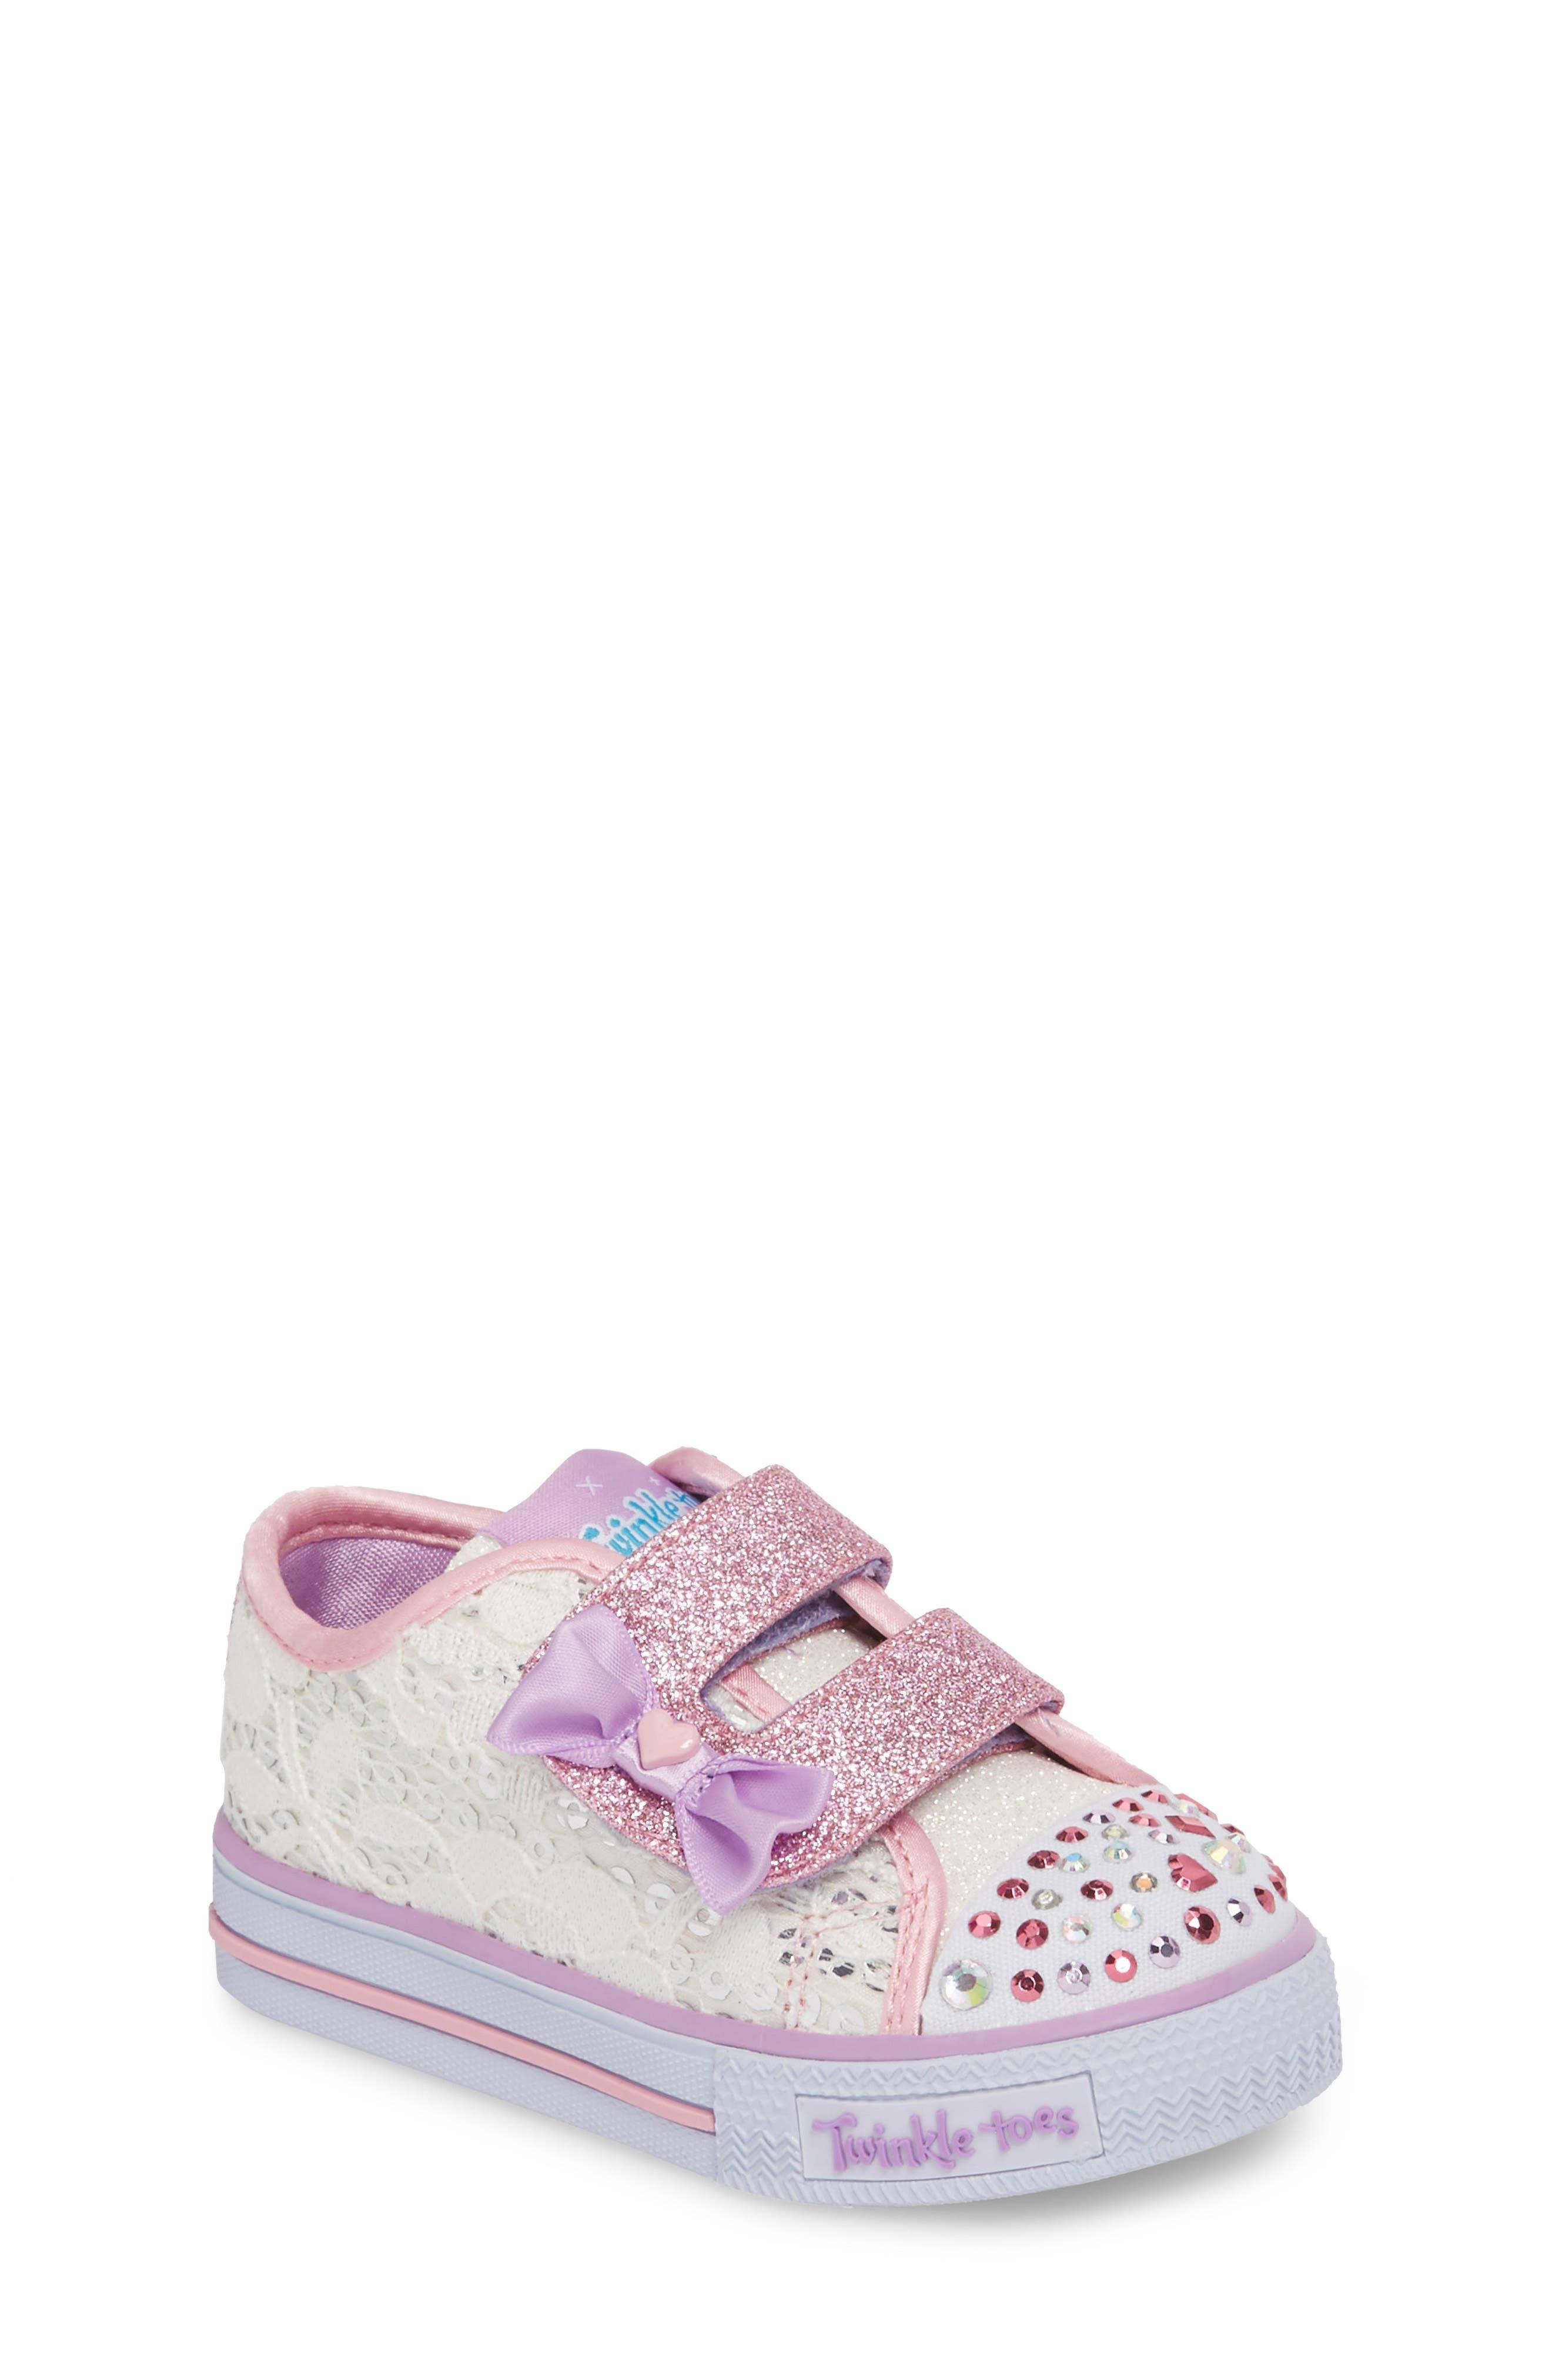 Twinkle Toes Shuffles Light-Up Glitter Sneaker,                         Main,                         color, 100